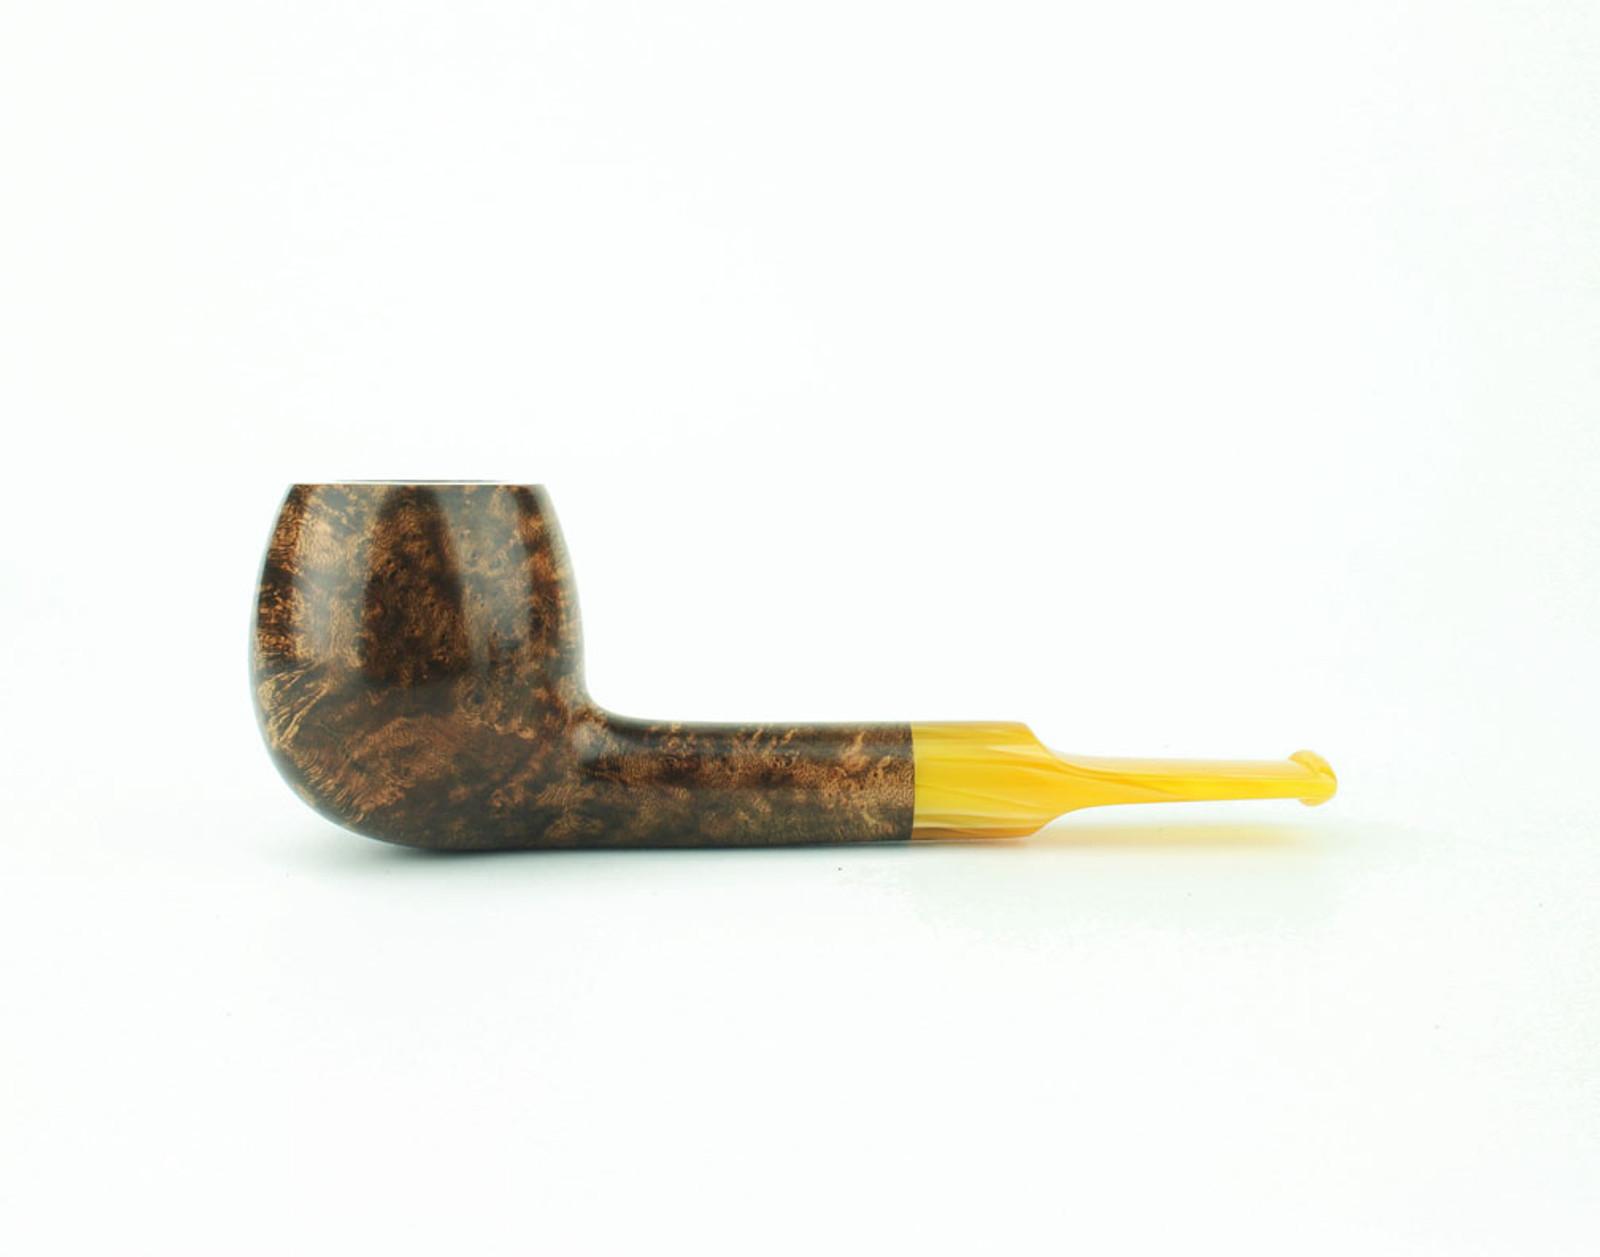 C81DS A - BriarWorks Classic C81 Straight Apple - Dark Smooth w/ Amber Stem